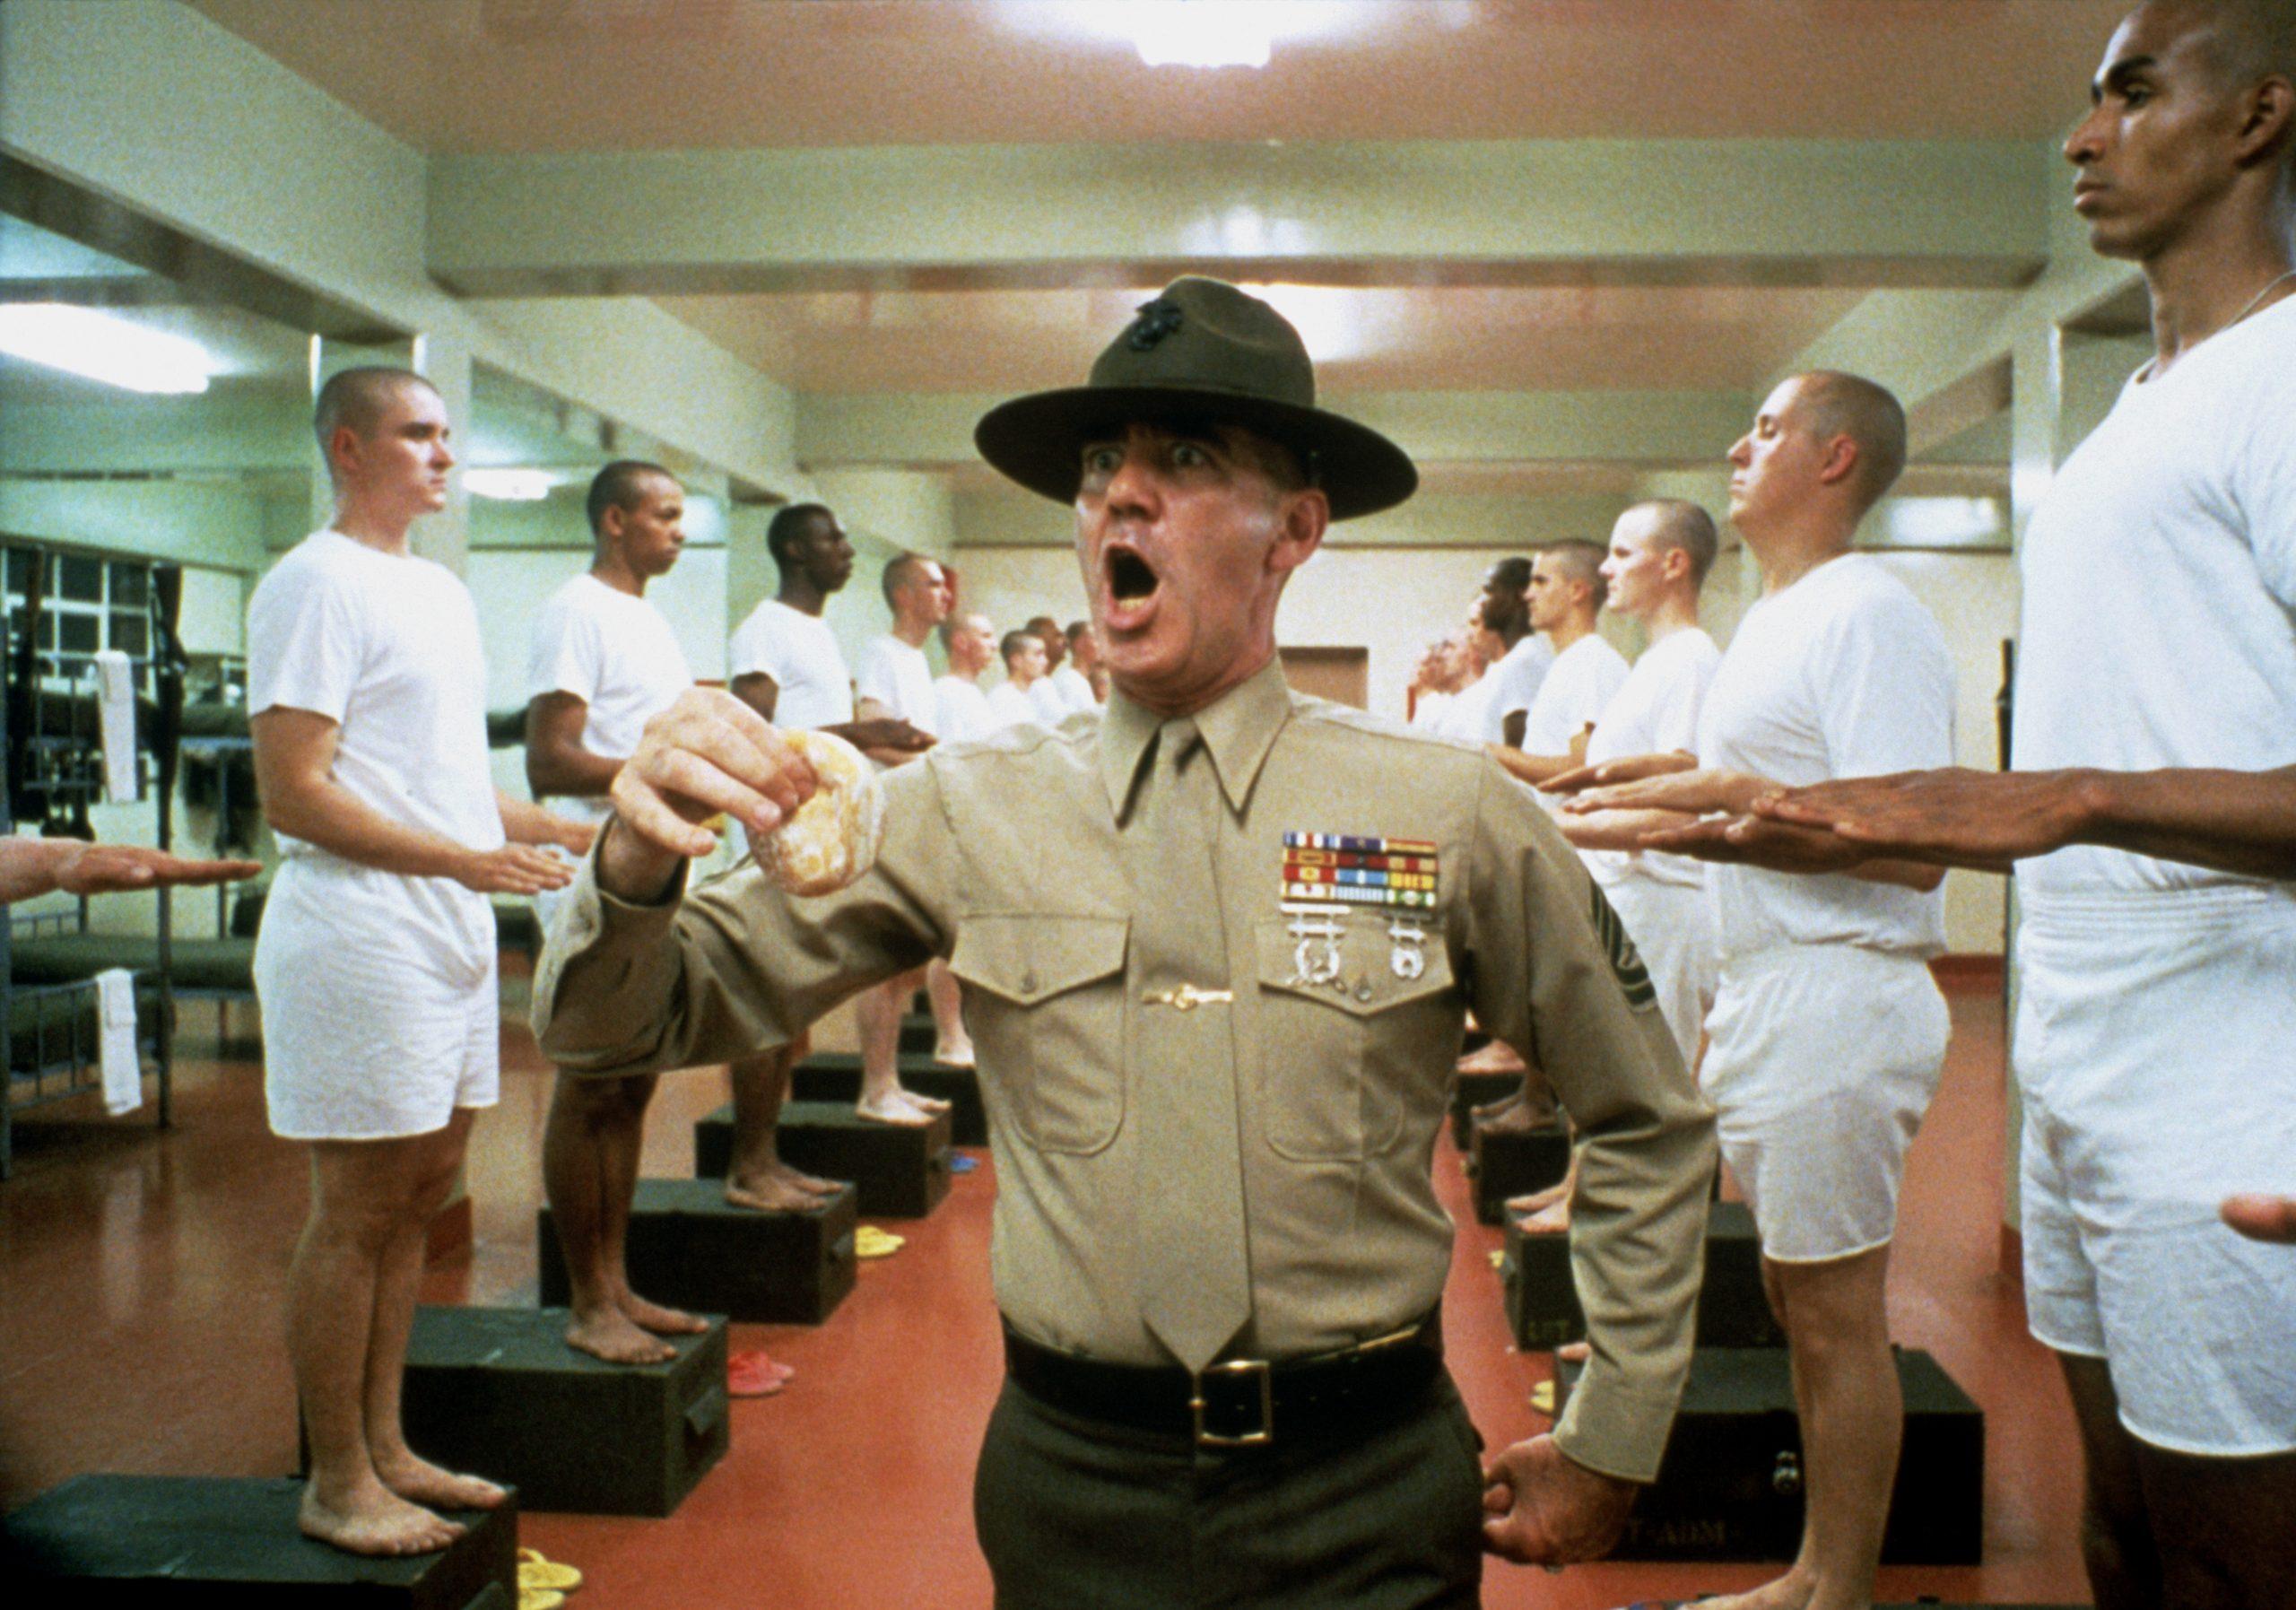 Gny. Stg. Hartman (Lee Ermey) harangues platoon members in the barracks